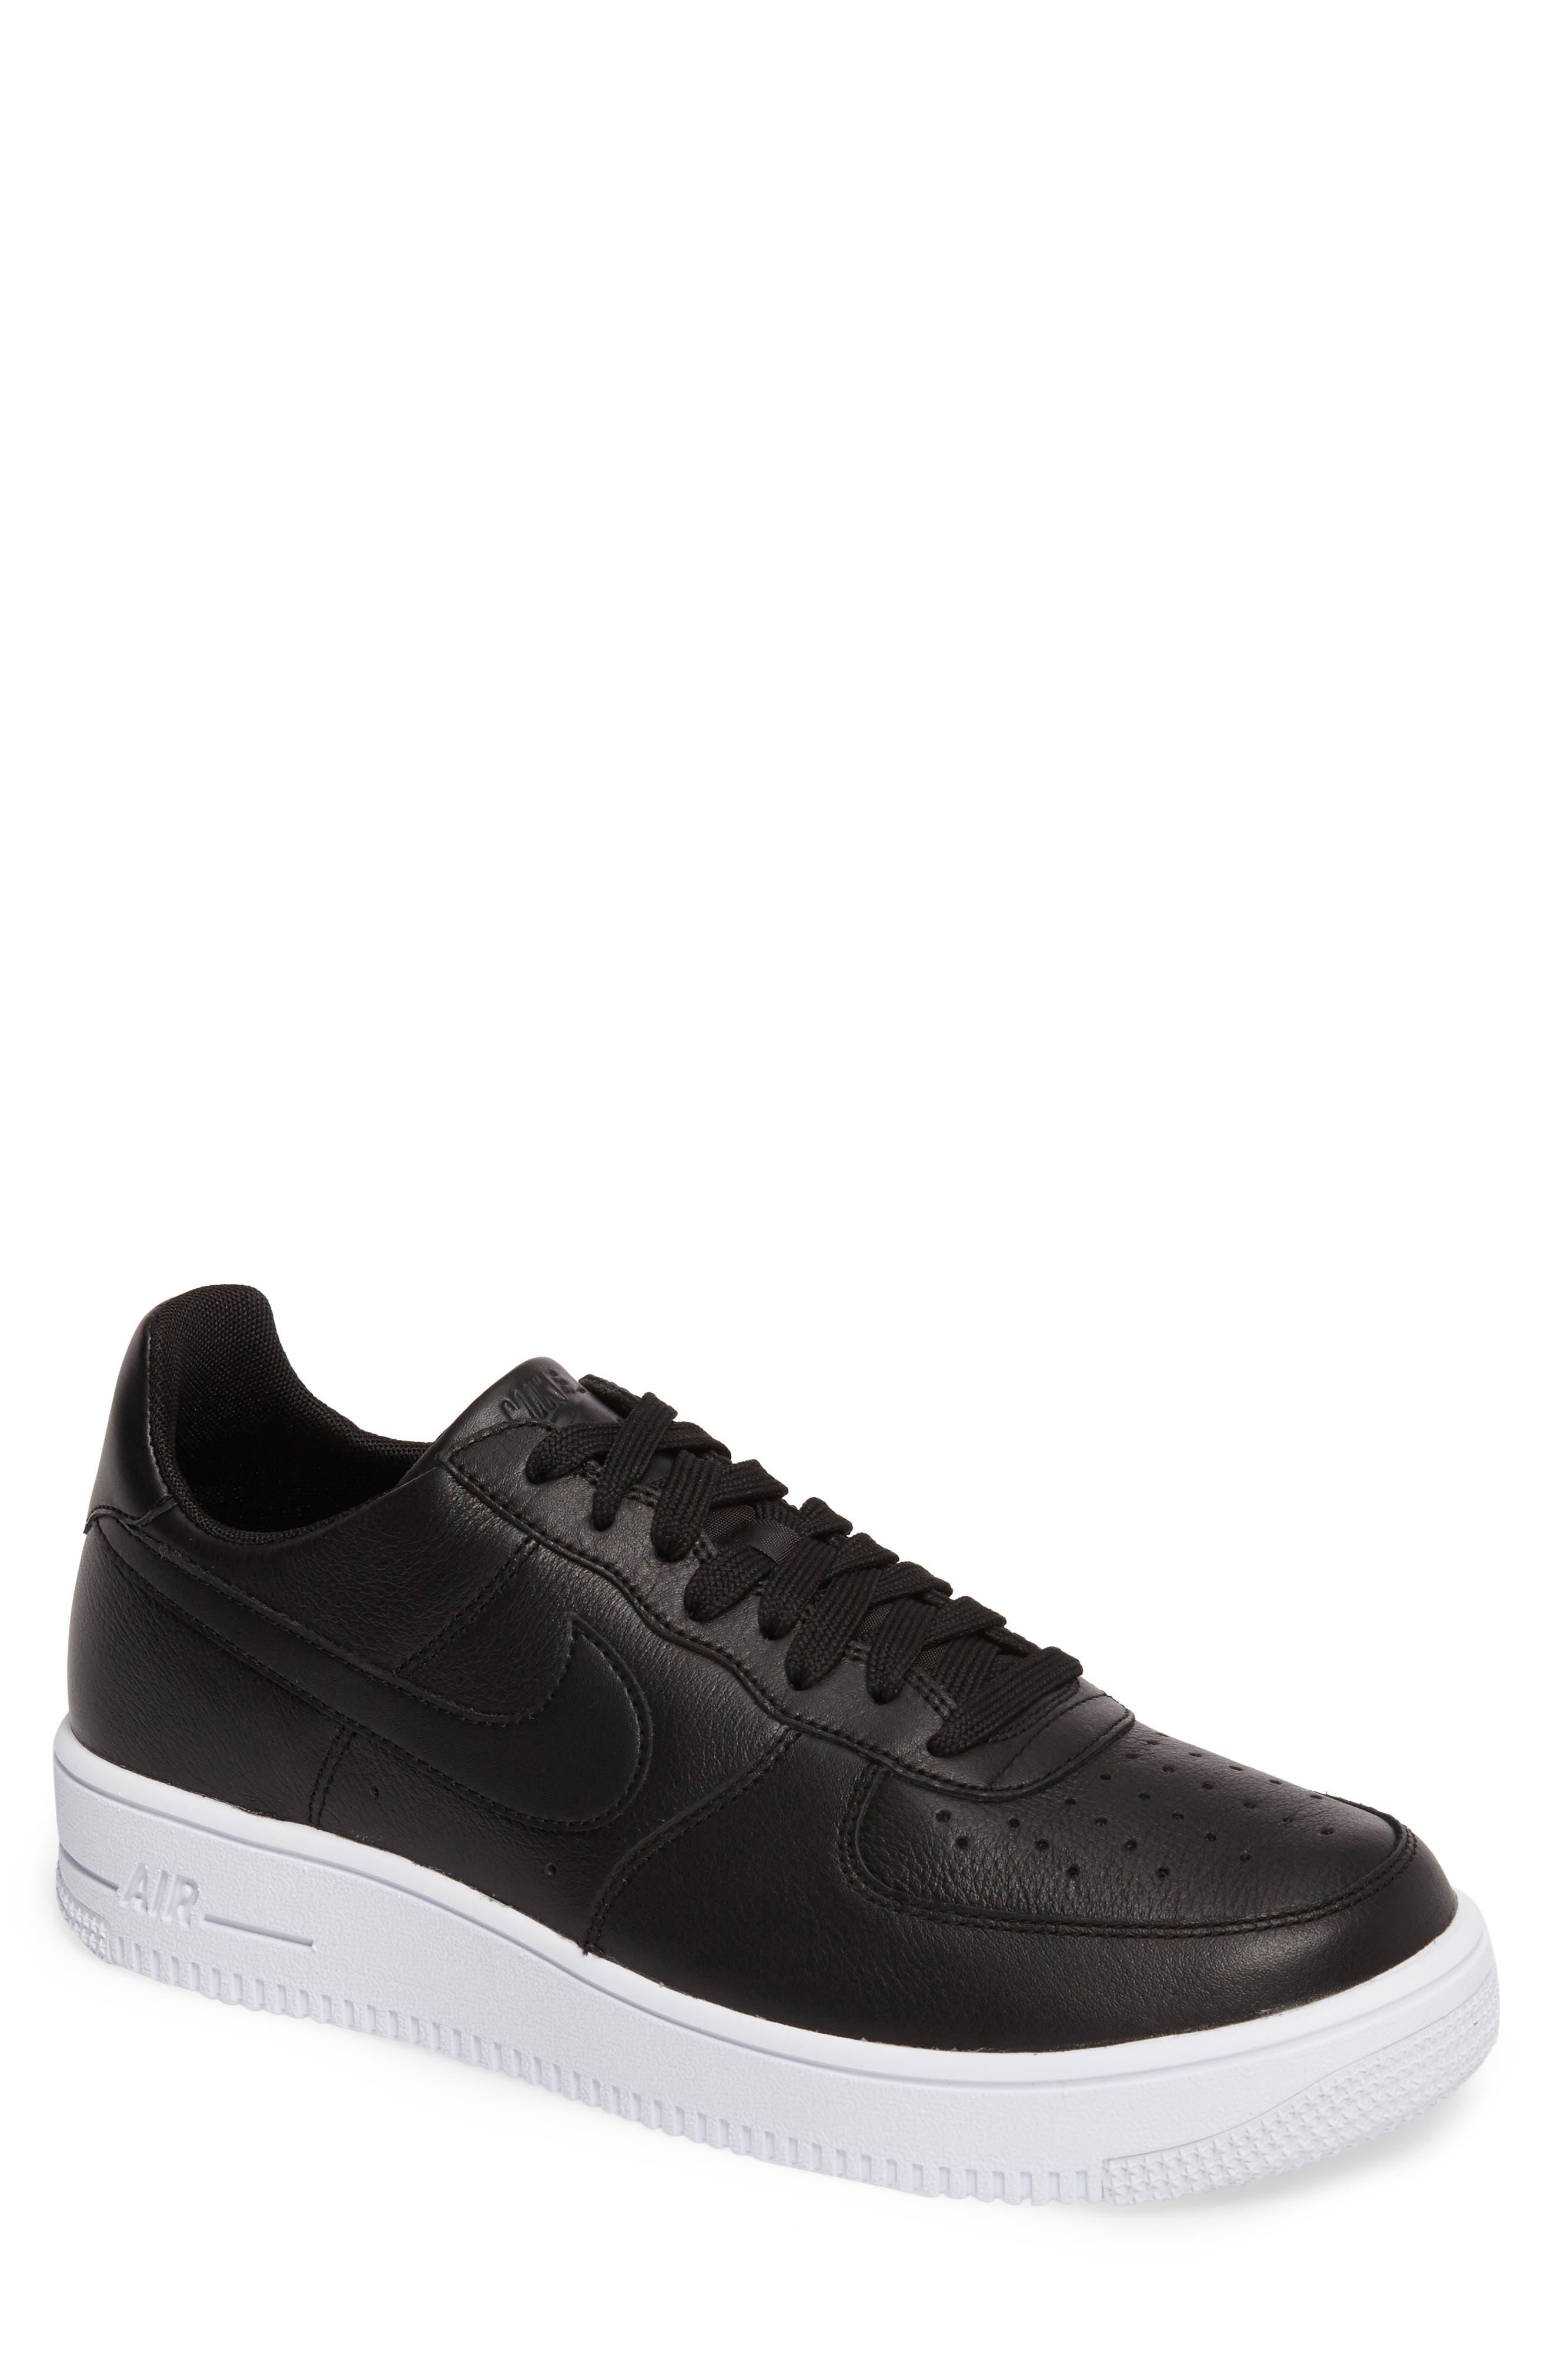 Air Force 1 Ultraforce Sneaker,                             Main thumbnail 1, color,                             003